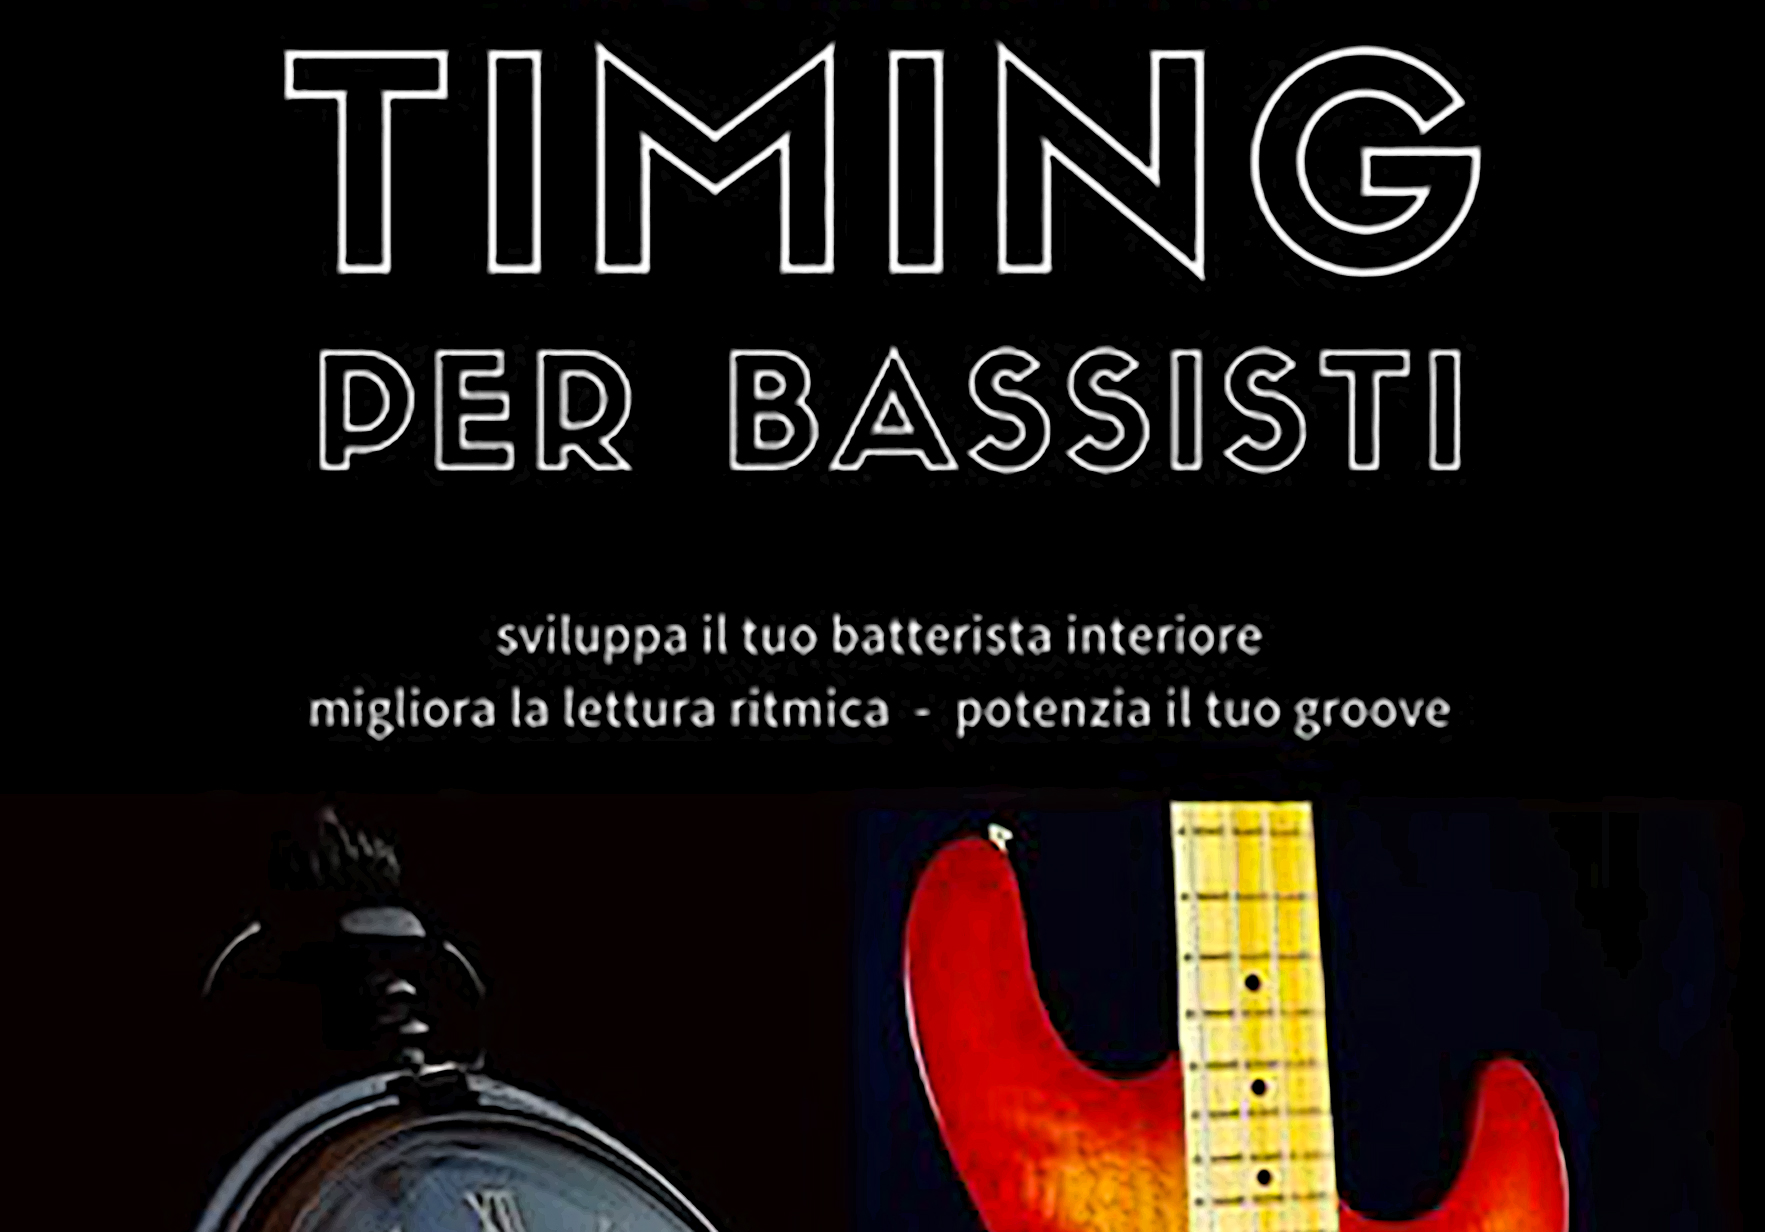 timing bassisti